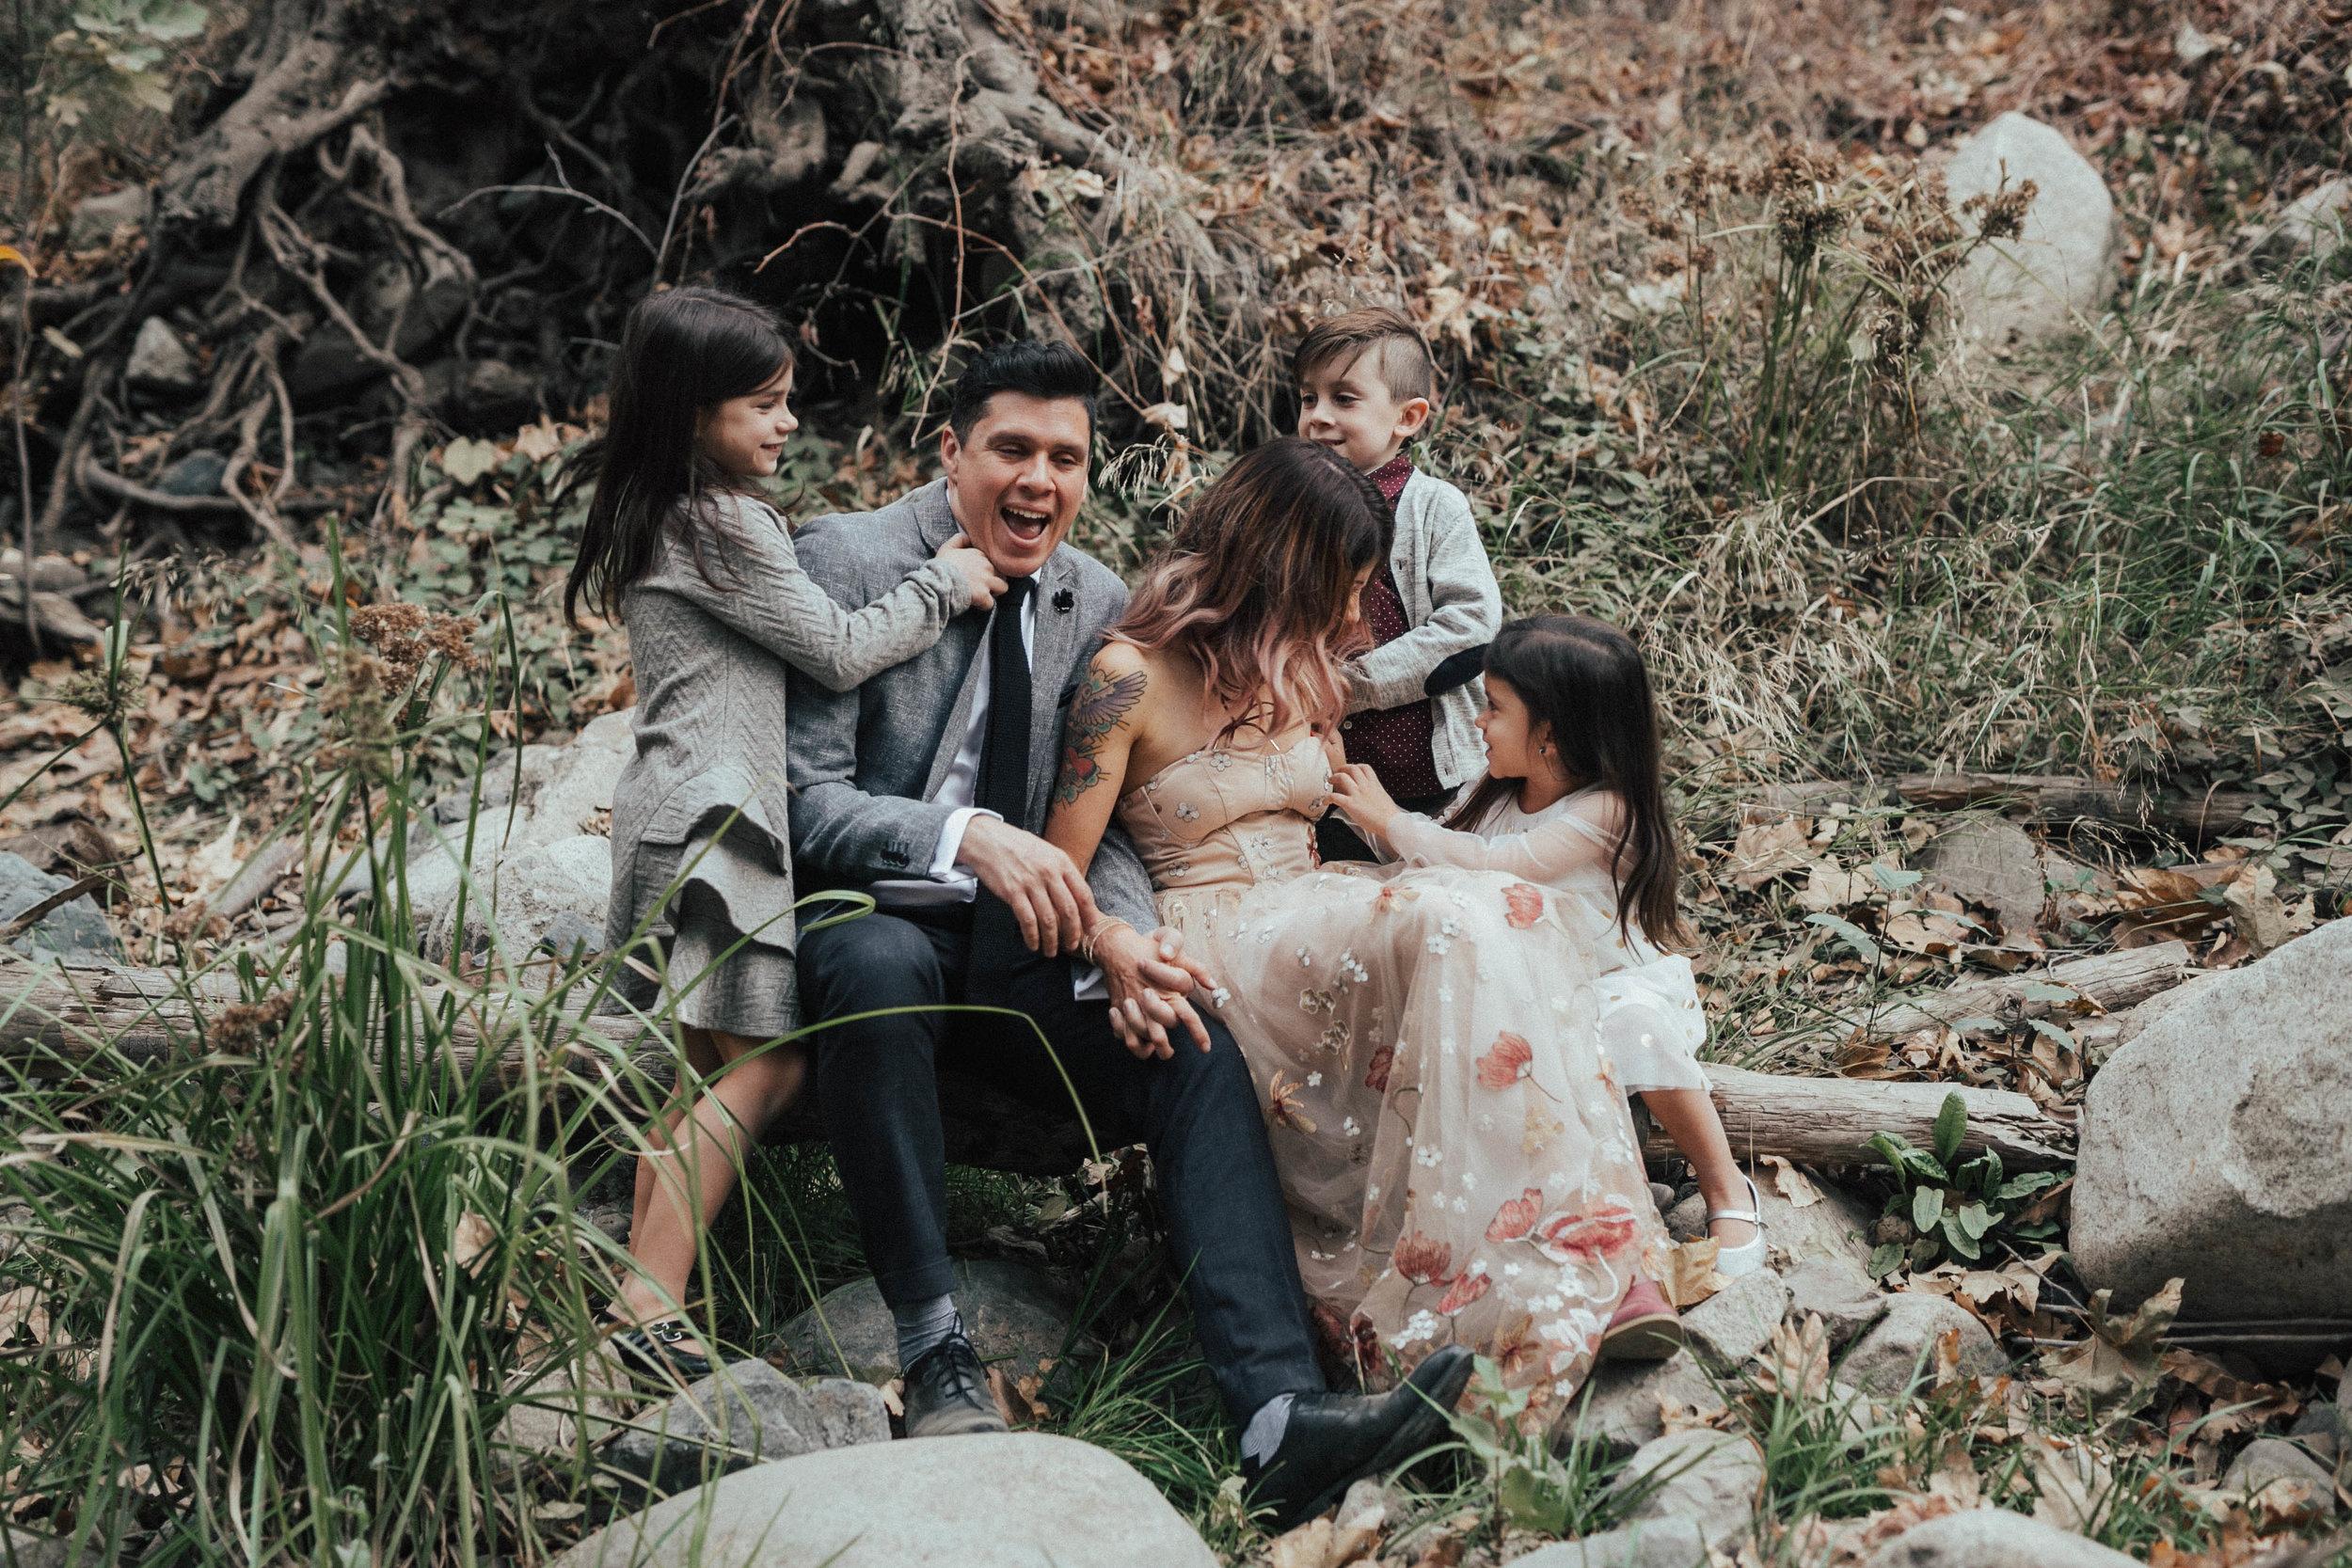 navarrofamily-121017-053.JPG